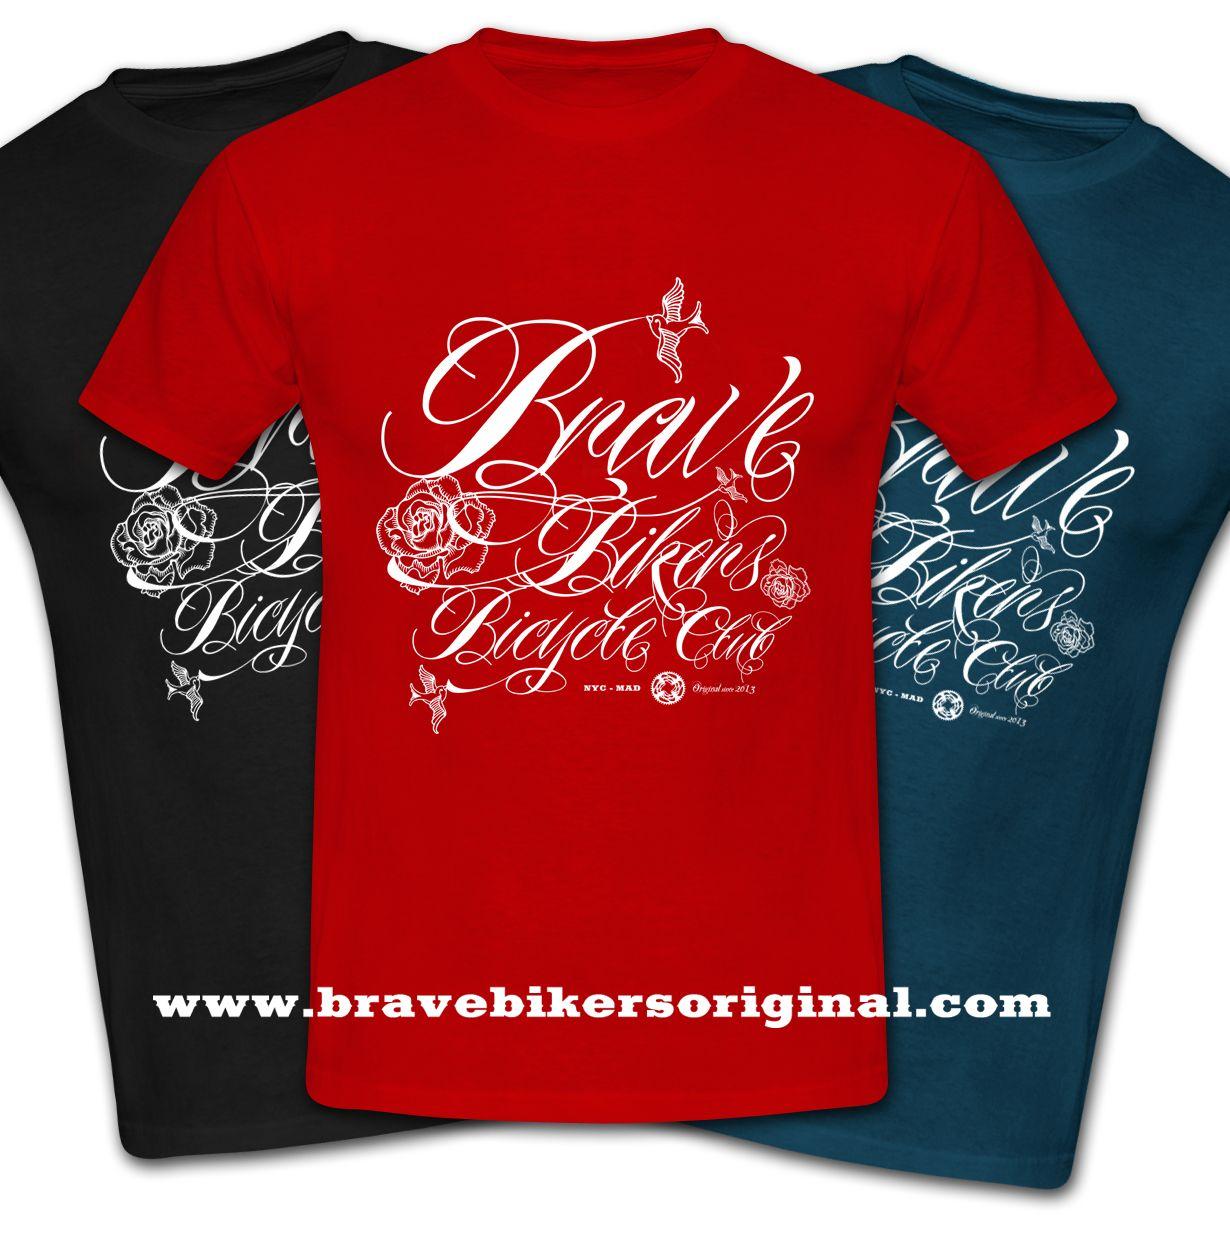 Nueva camiseta inspiración tatuaje / New shirt inspired tattooOnly inhttp://www.bravebikersoriginal.com/ #bravebikers #bbbc #bike #tattoo